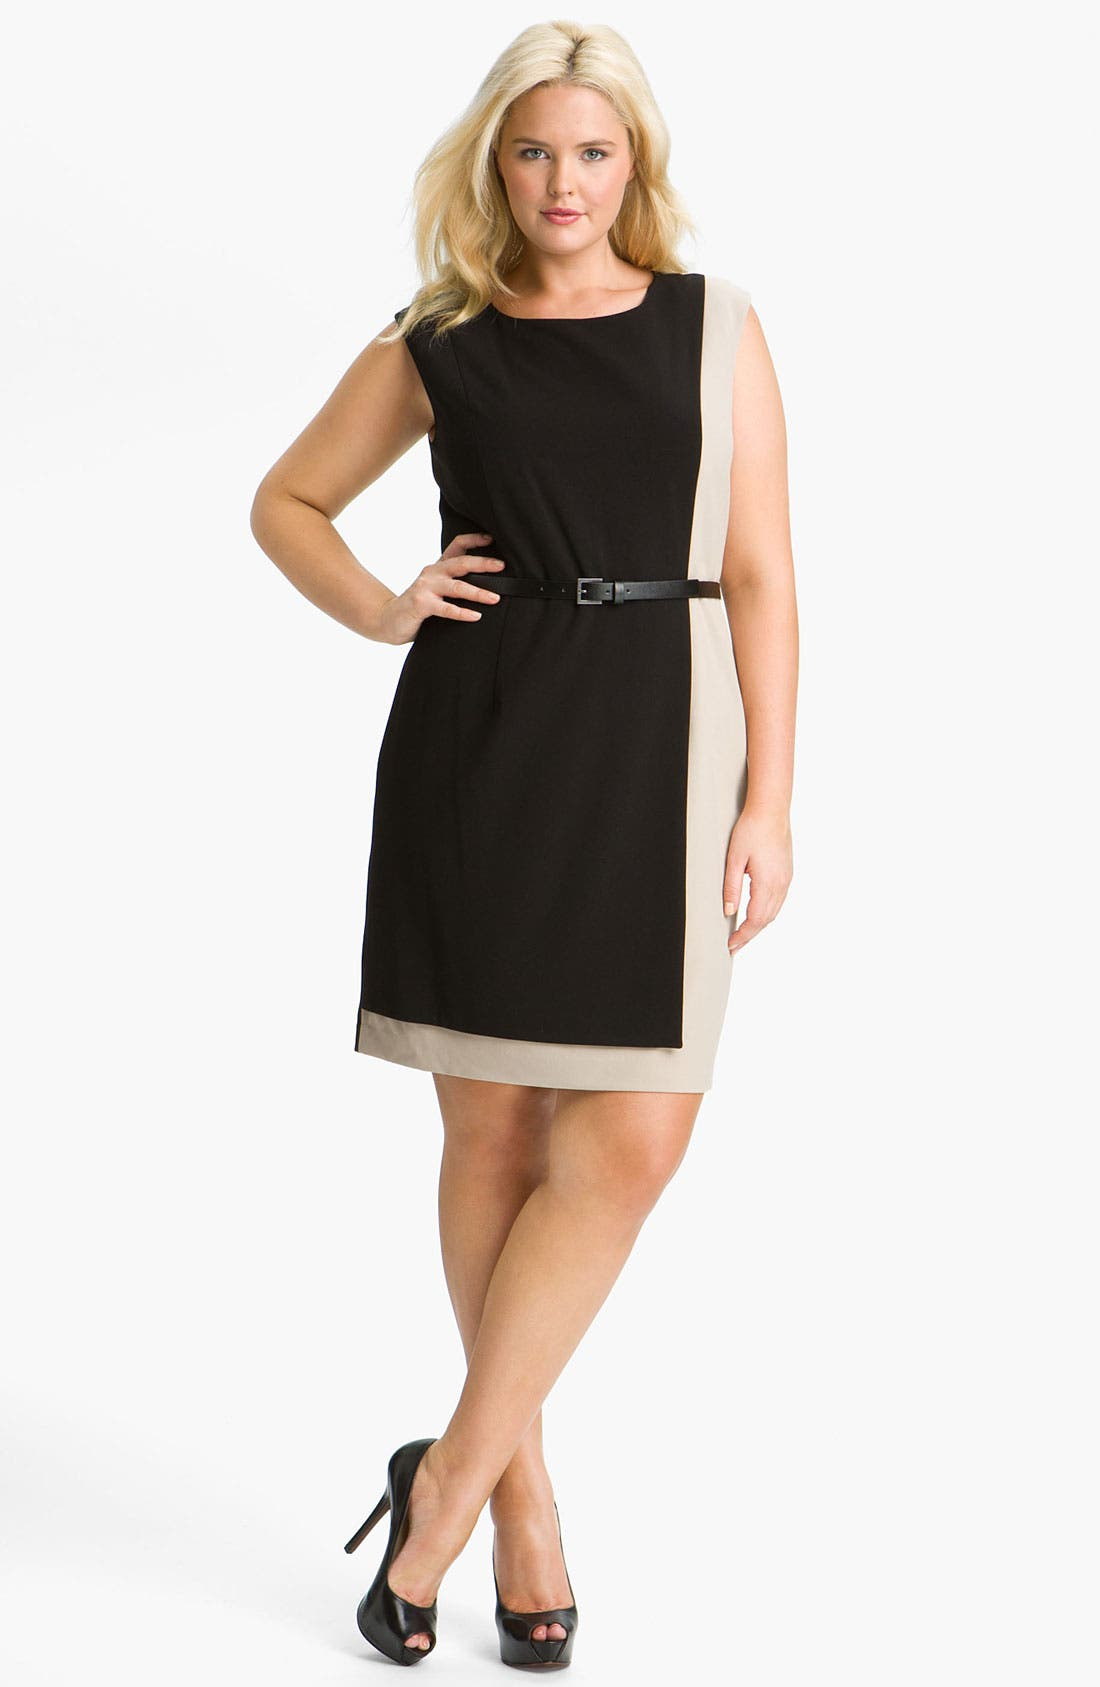 Alternate Image 1 Selected - Calvin Klein Colorblock Belted Sheath Dress (Plus Size)